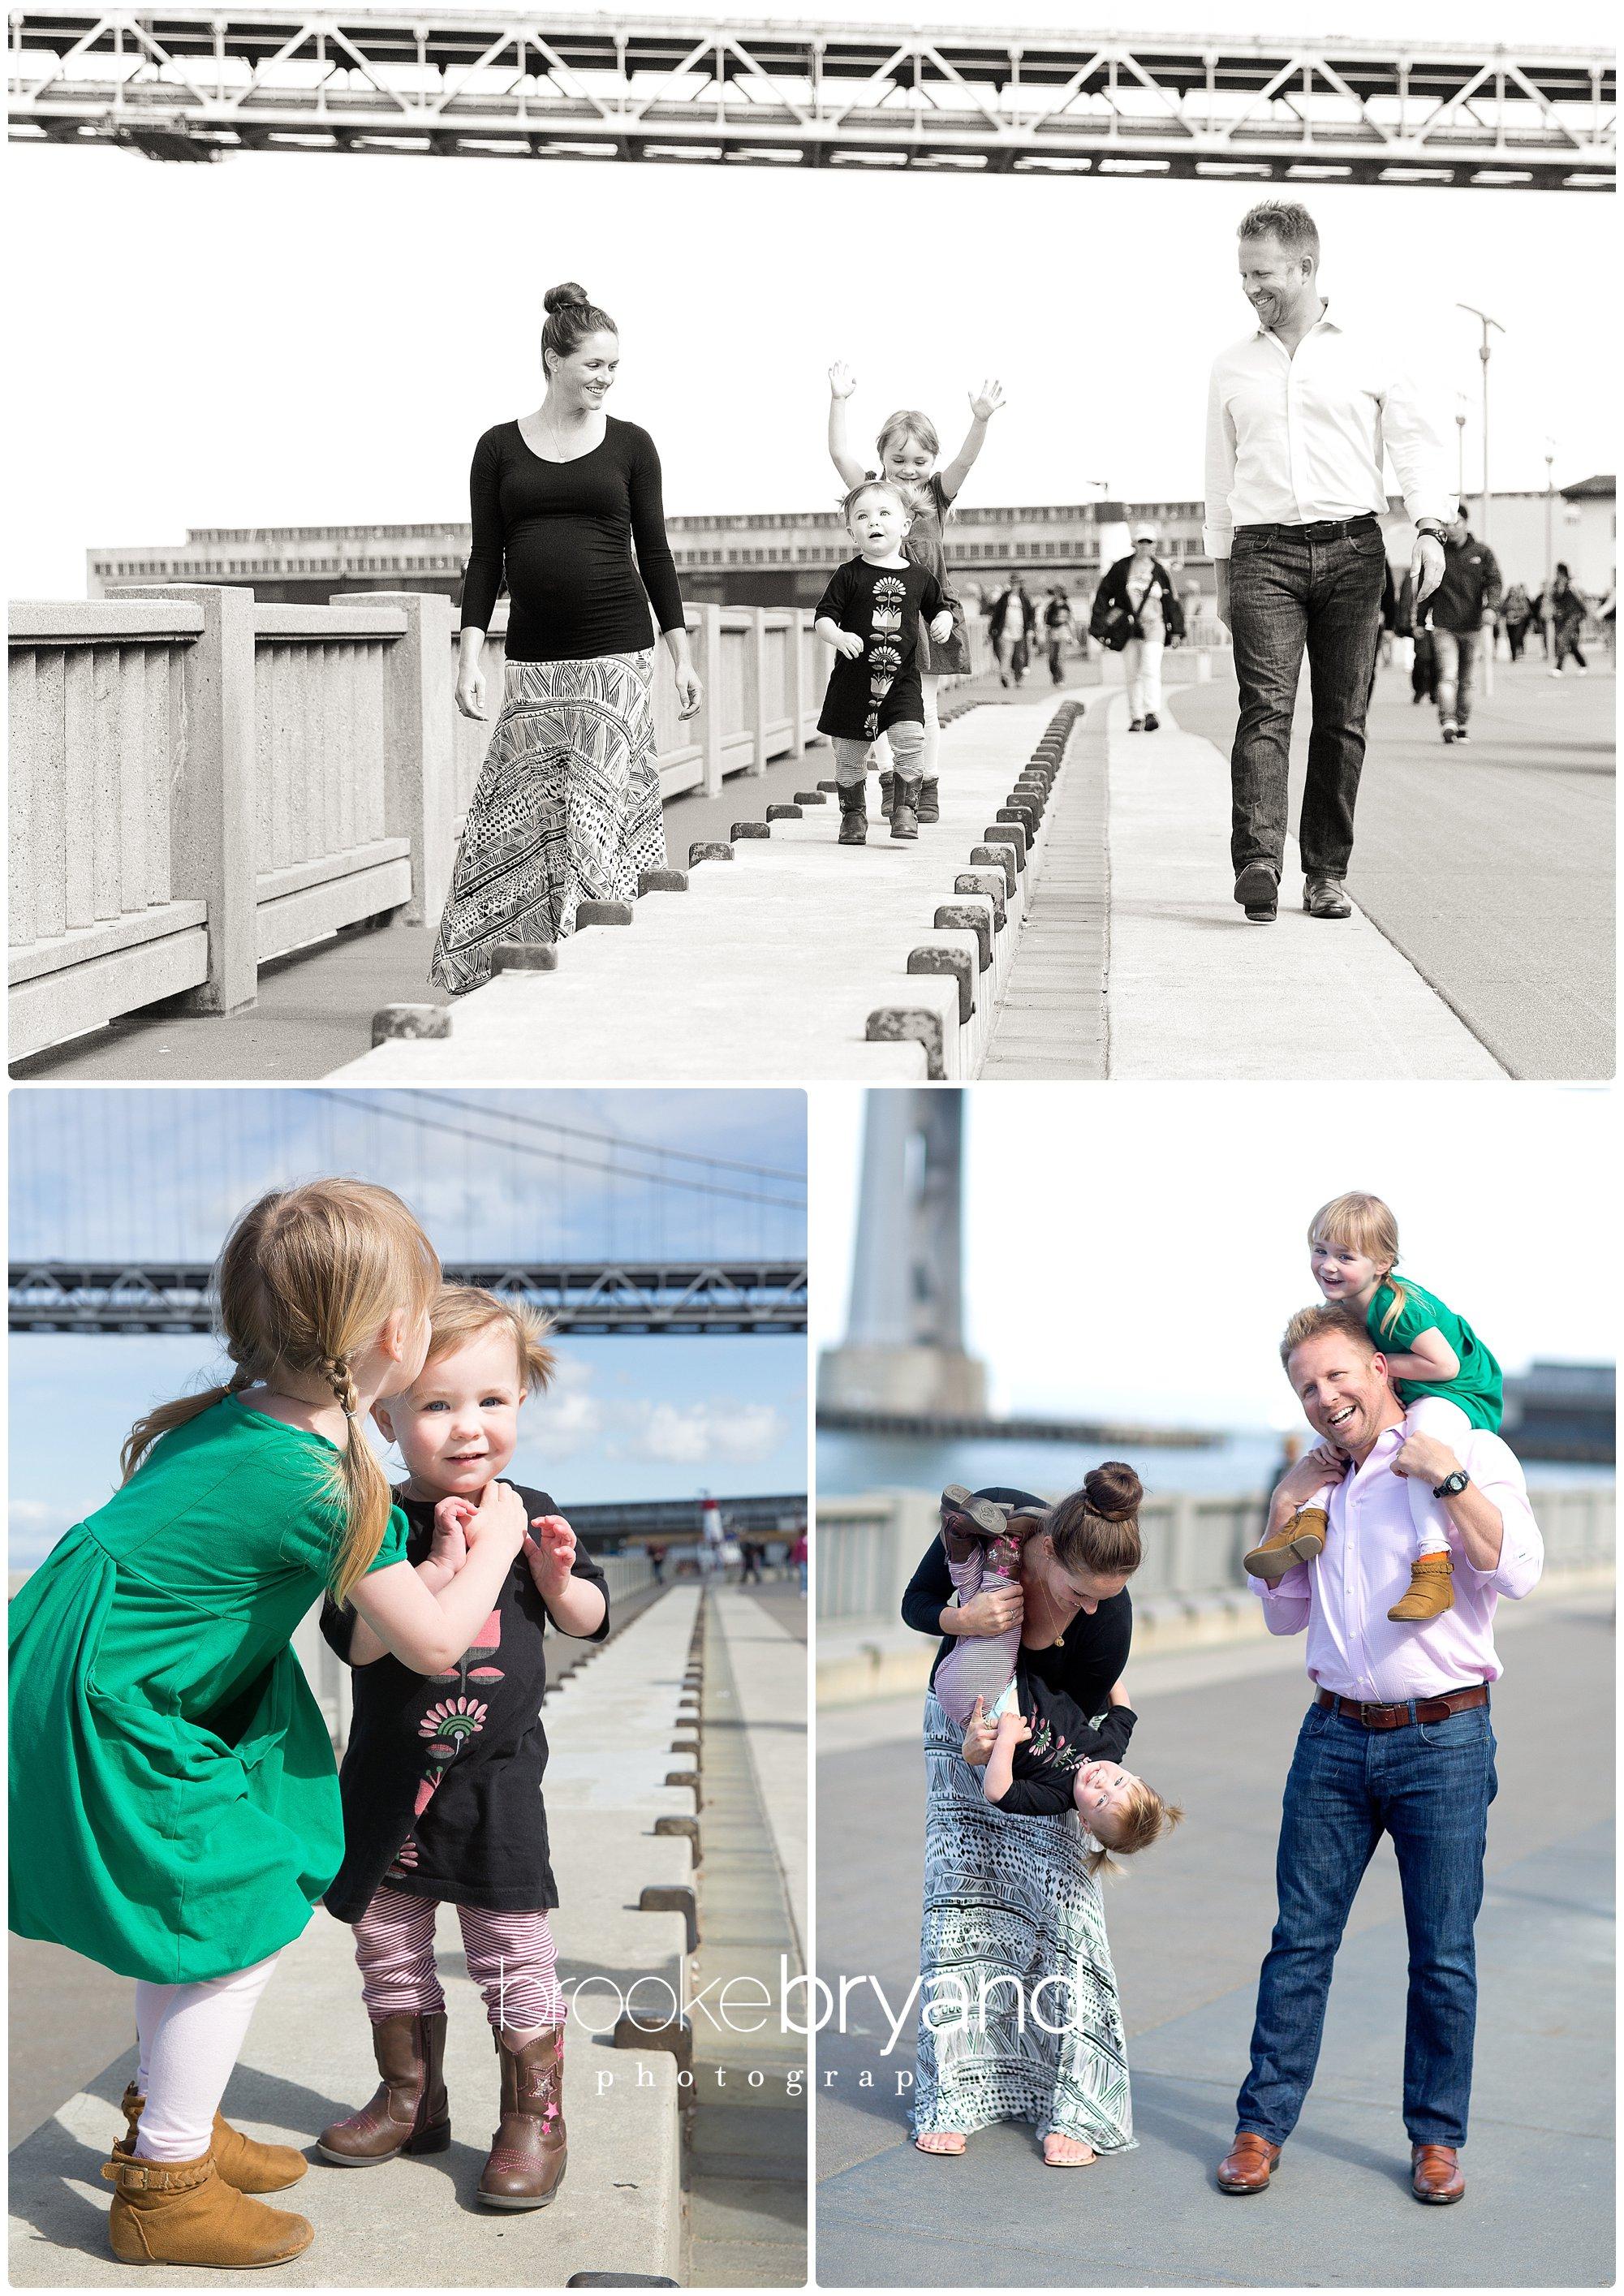 04.2014-James-Bow-and-Arrow-Maternity-photos-BBP_9463-BrookeBryand_San-Francisco-Family-Photos-Brooke-Bryand-Photography.jpg